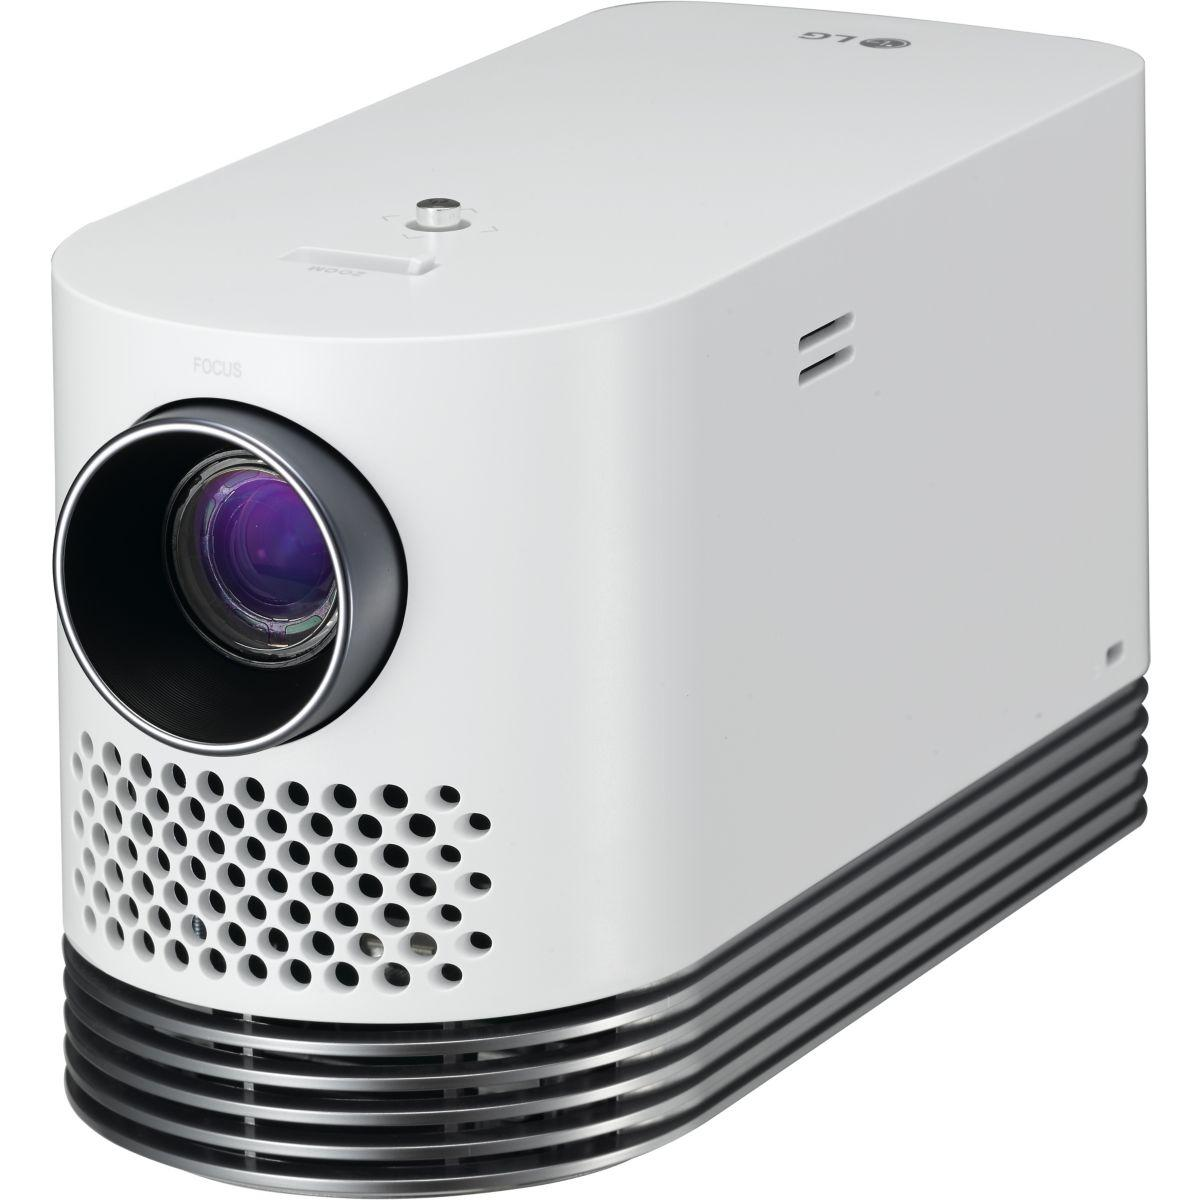 Projecteur lg hf80jg - livraison offerte : code chronoff